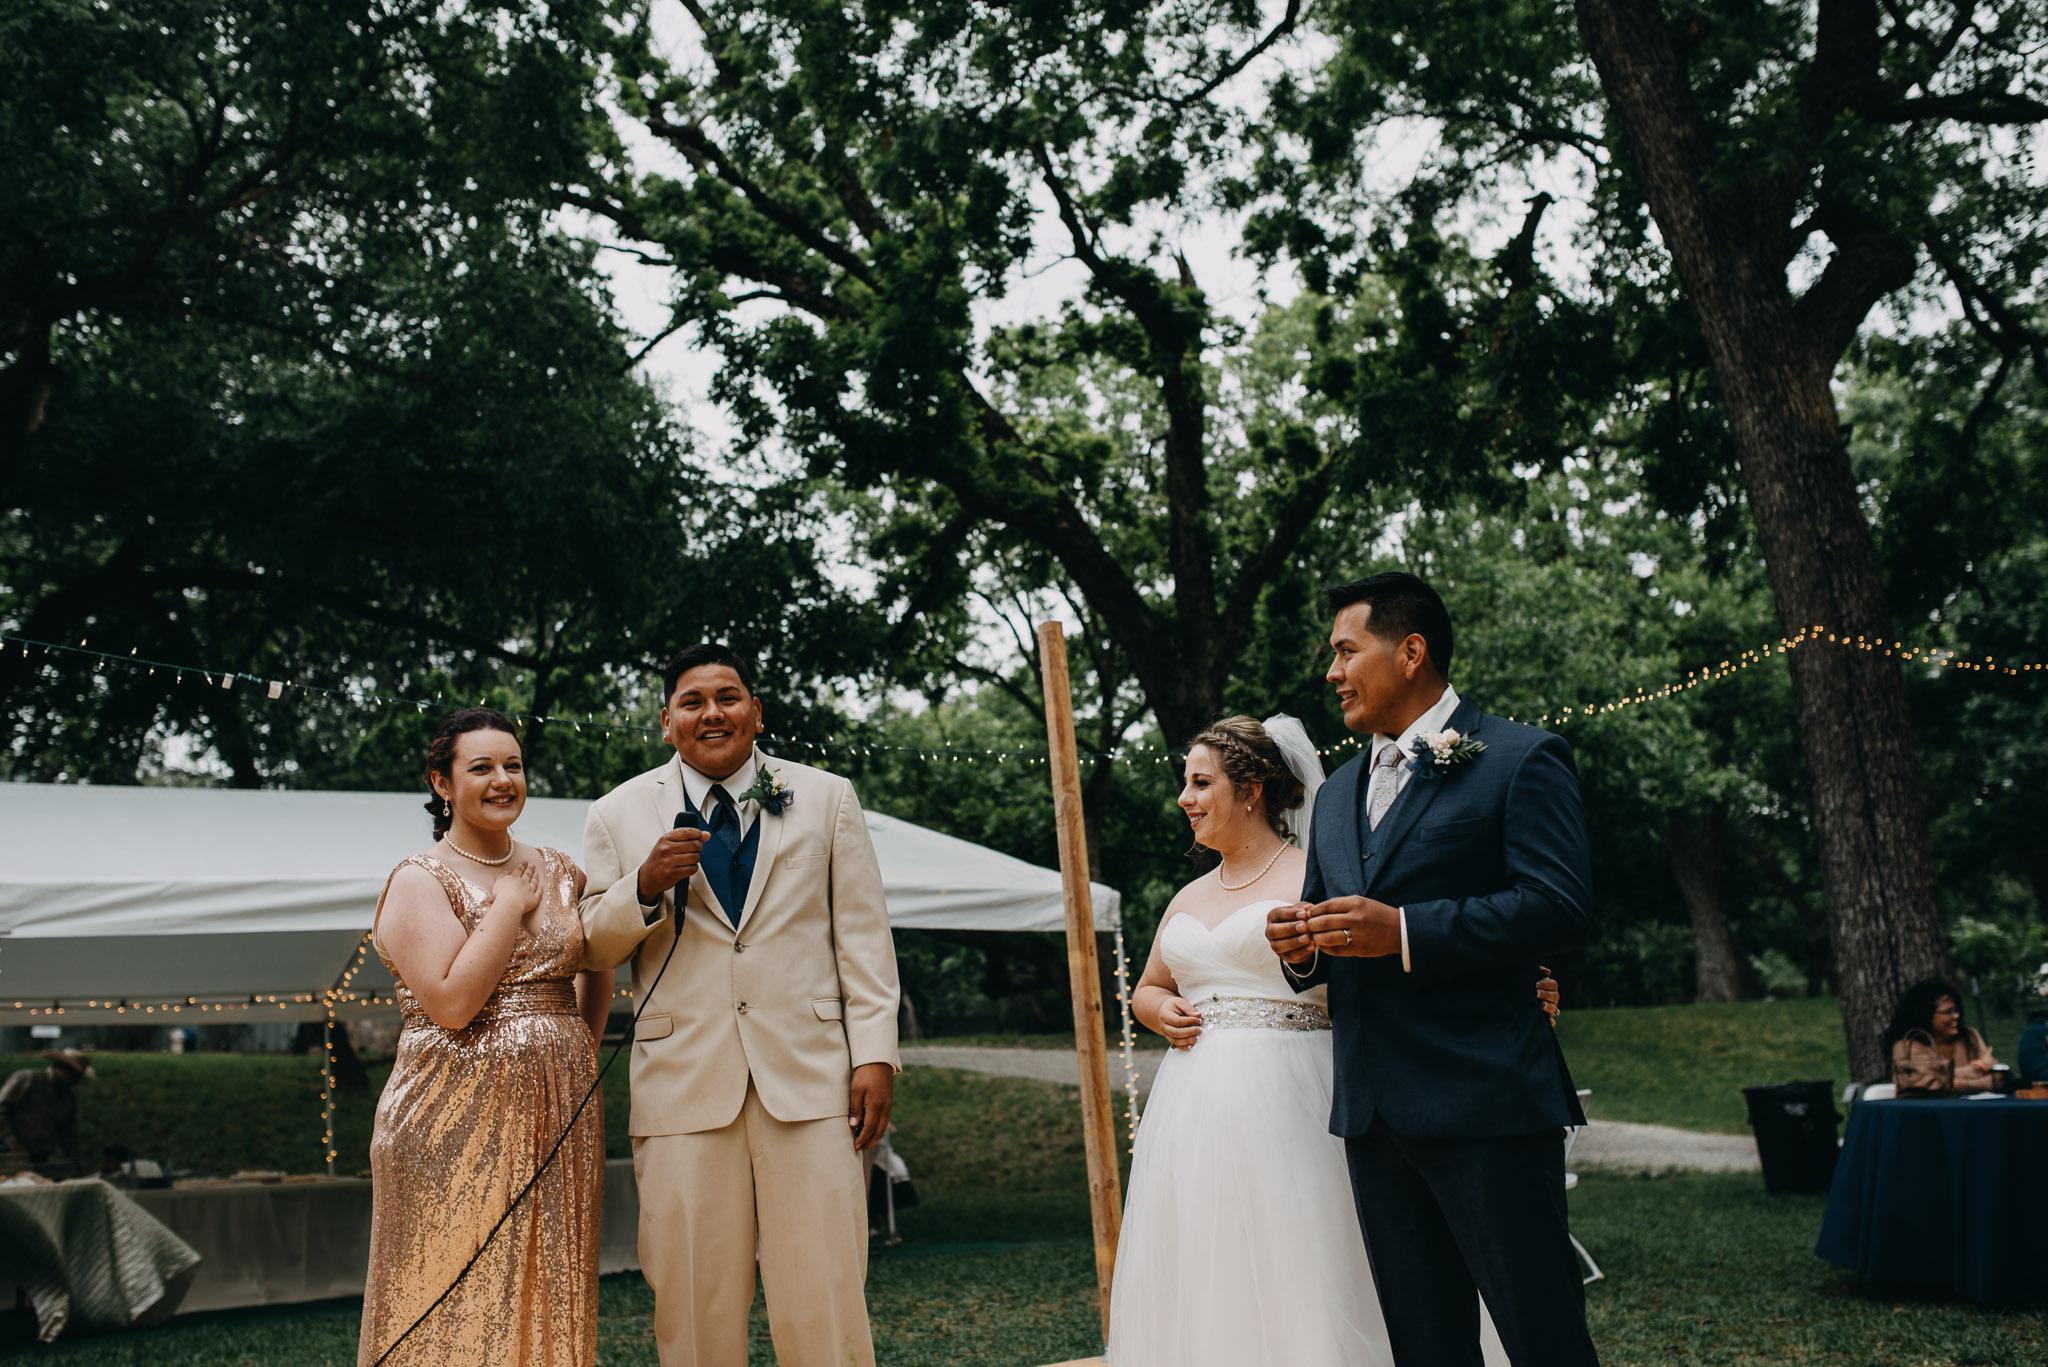 Christoval-Texas-Wedding_Photographer-Meghan&Tony-0021.jpg